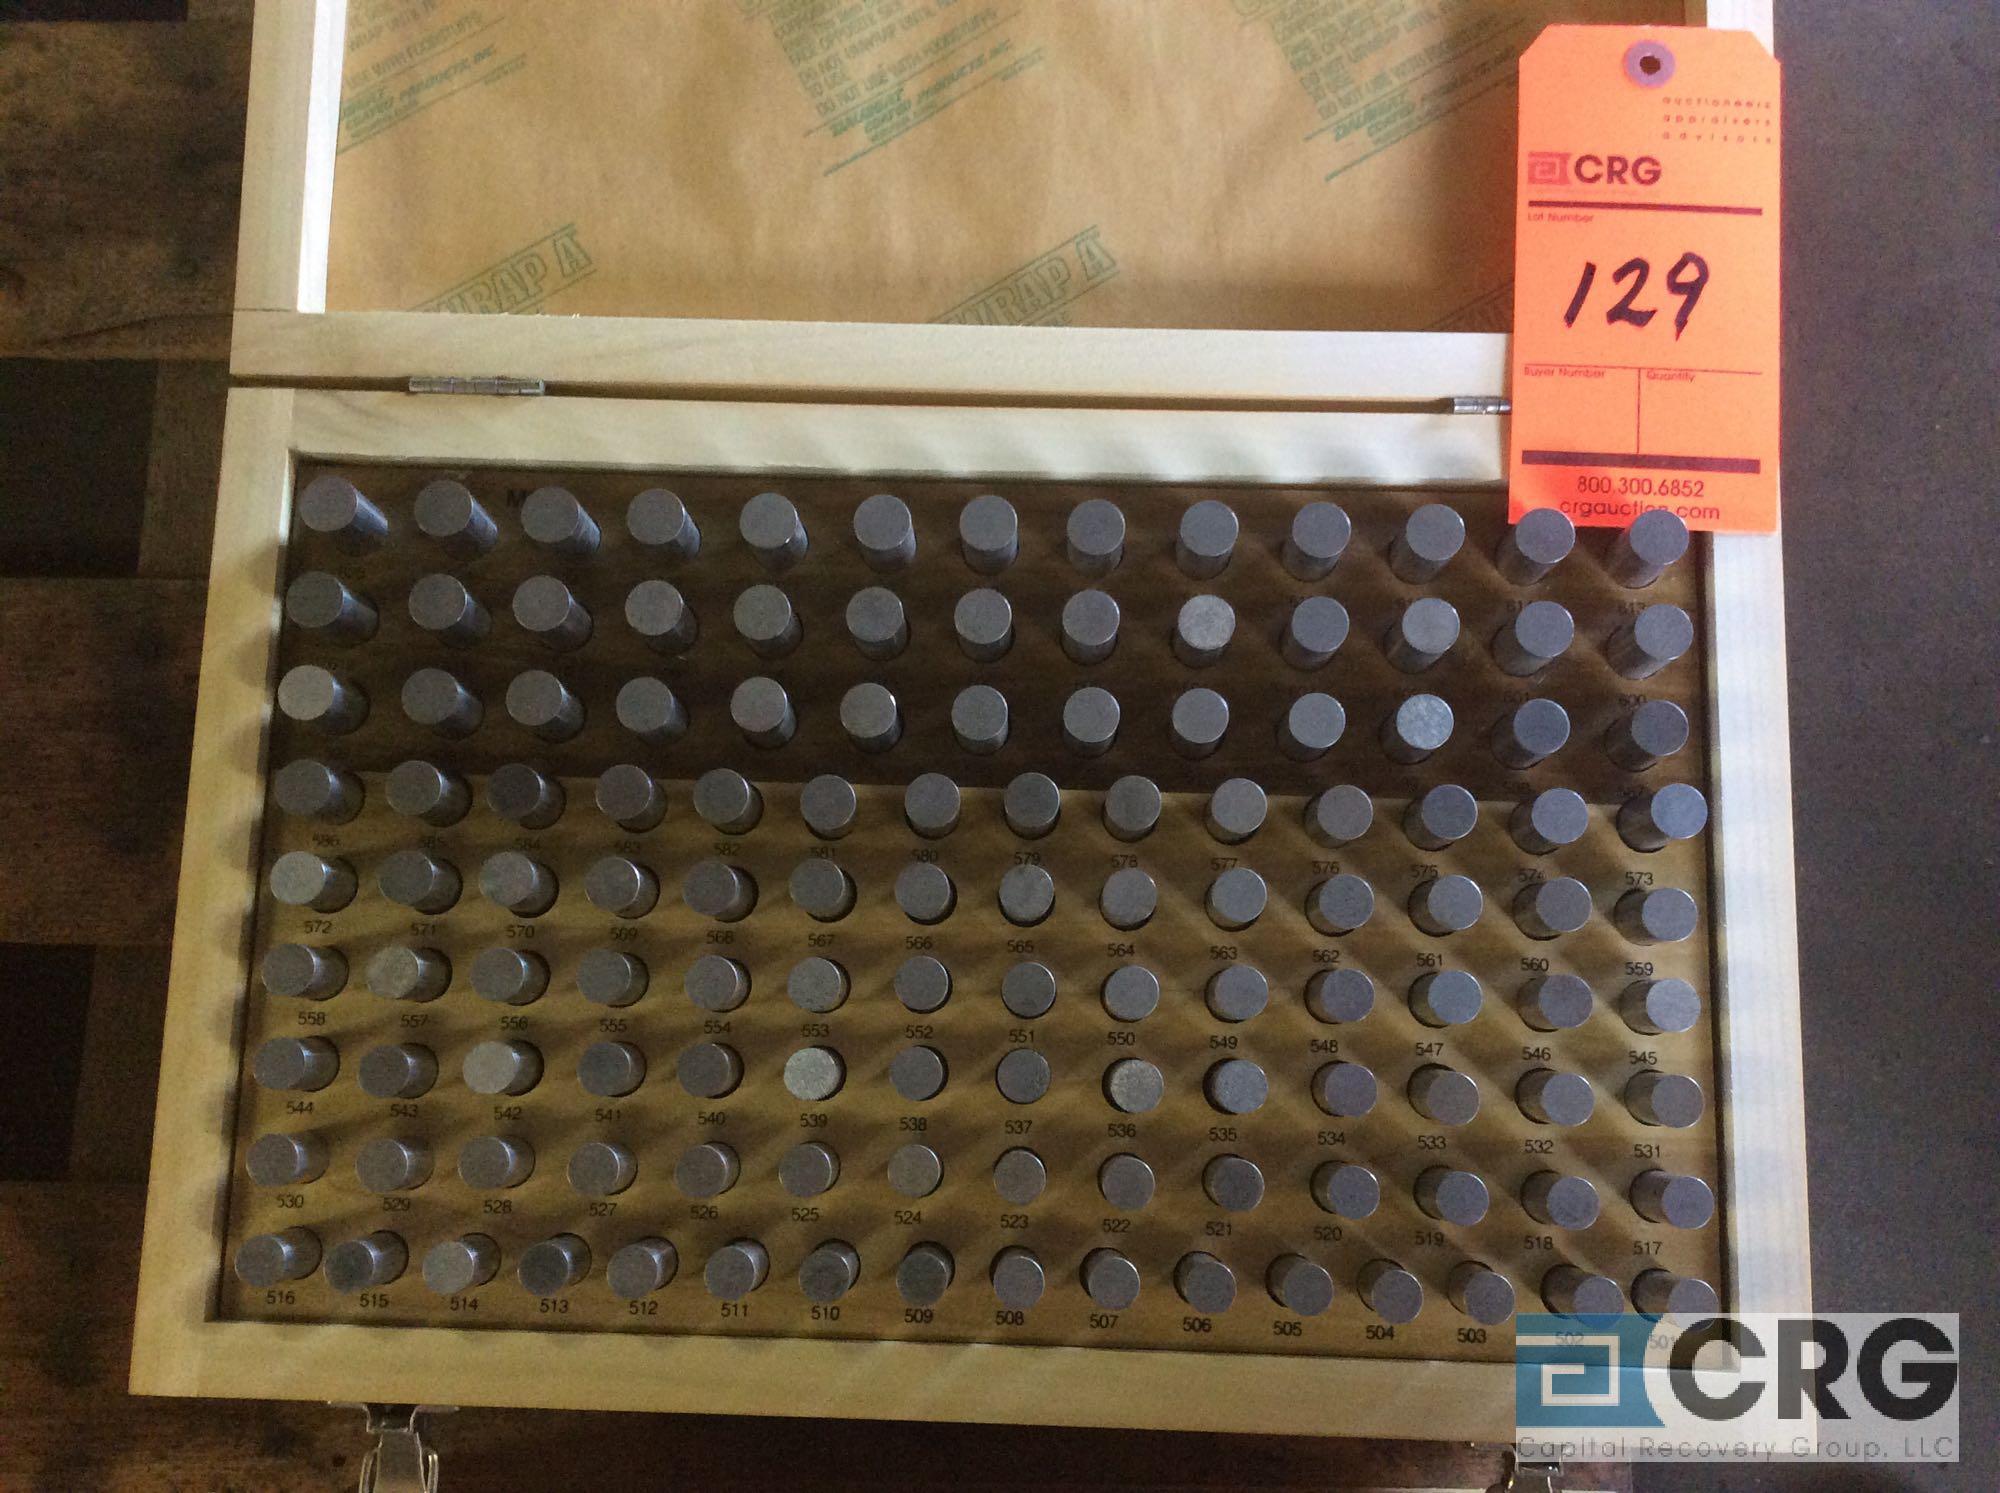 Lot 129 - Lot of (3) Pin Gage Minus .5015 - .6255 sets